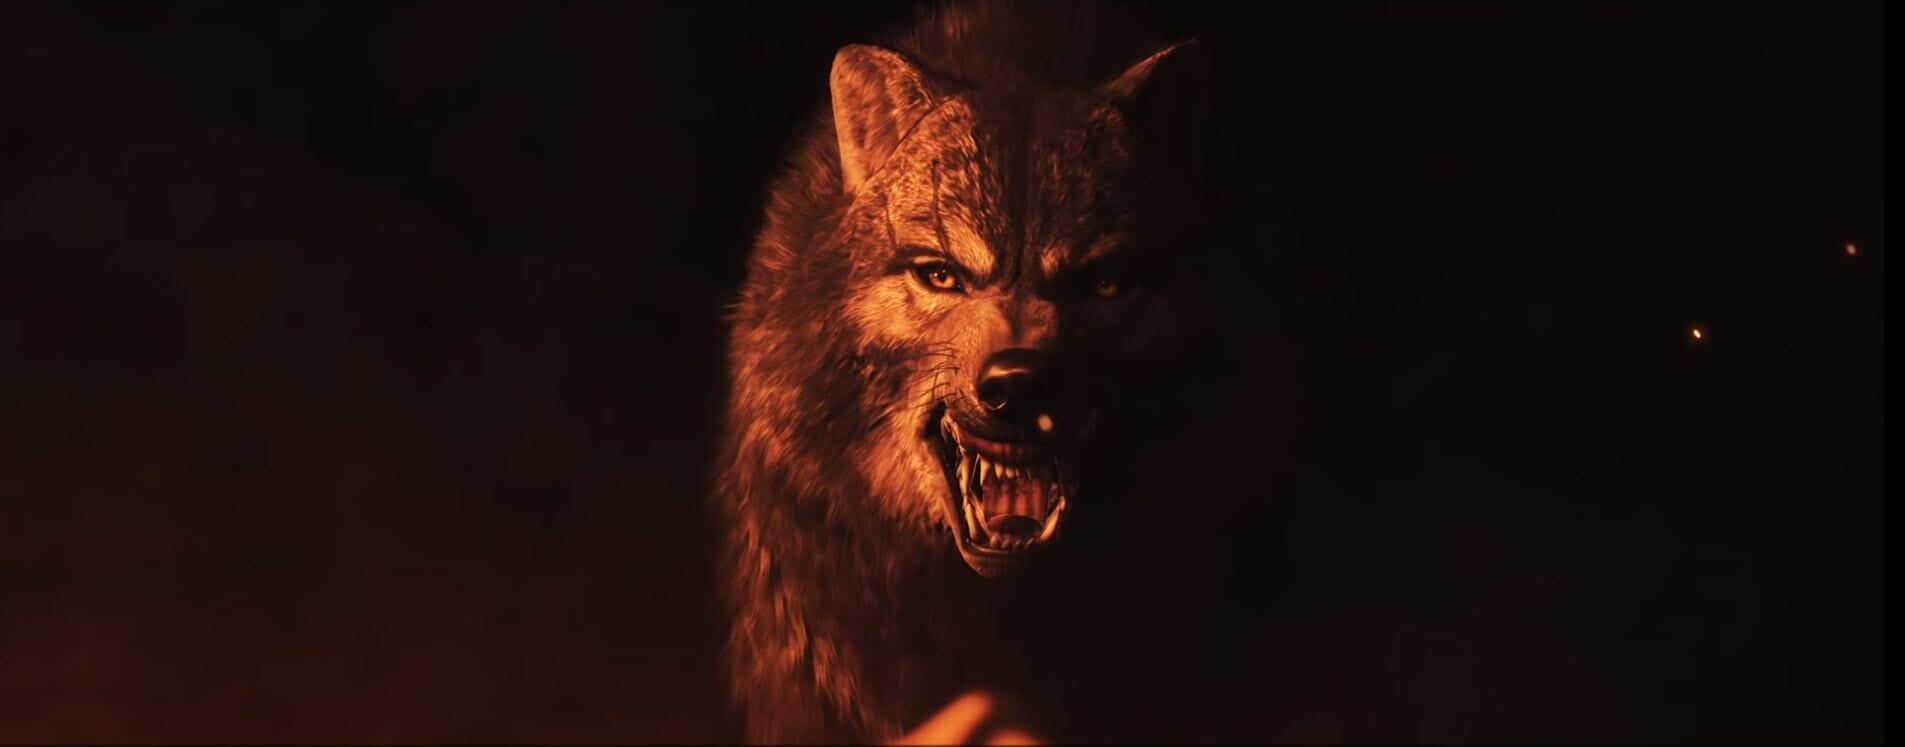 Werewolf: The Apocalypse 5th Edition (W5) in progress